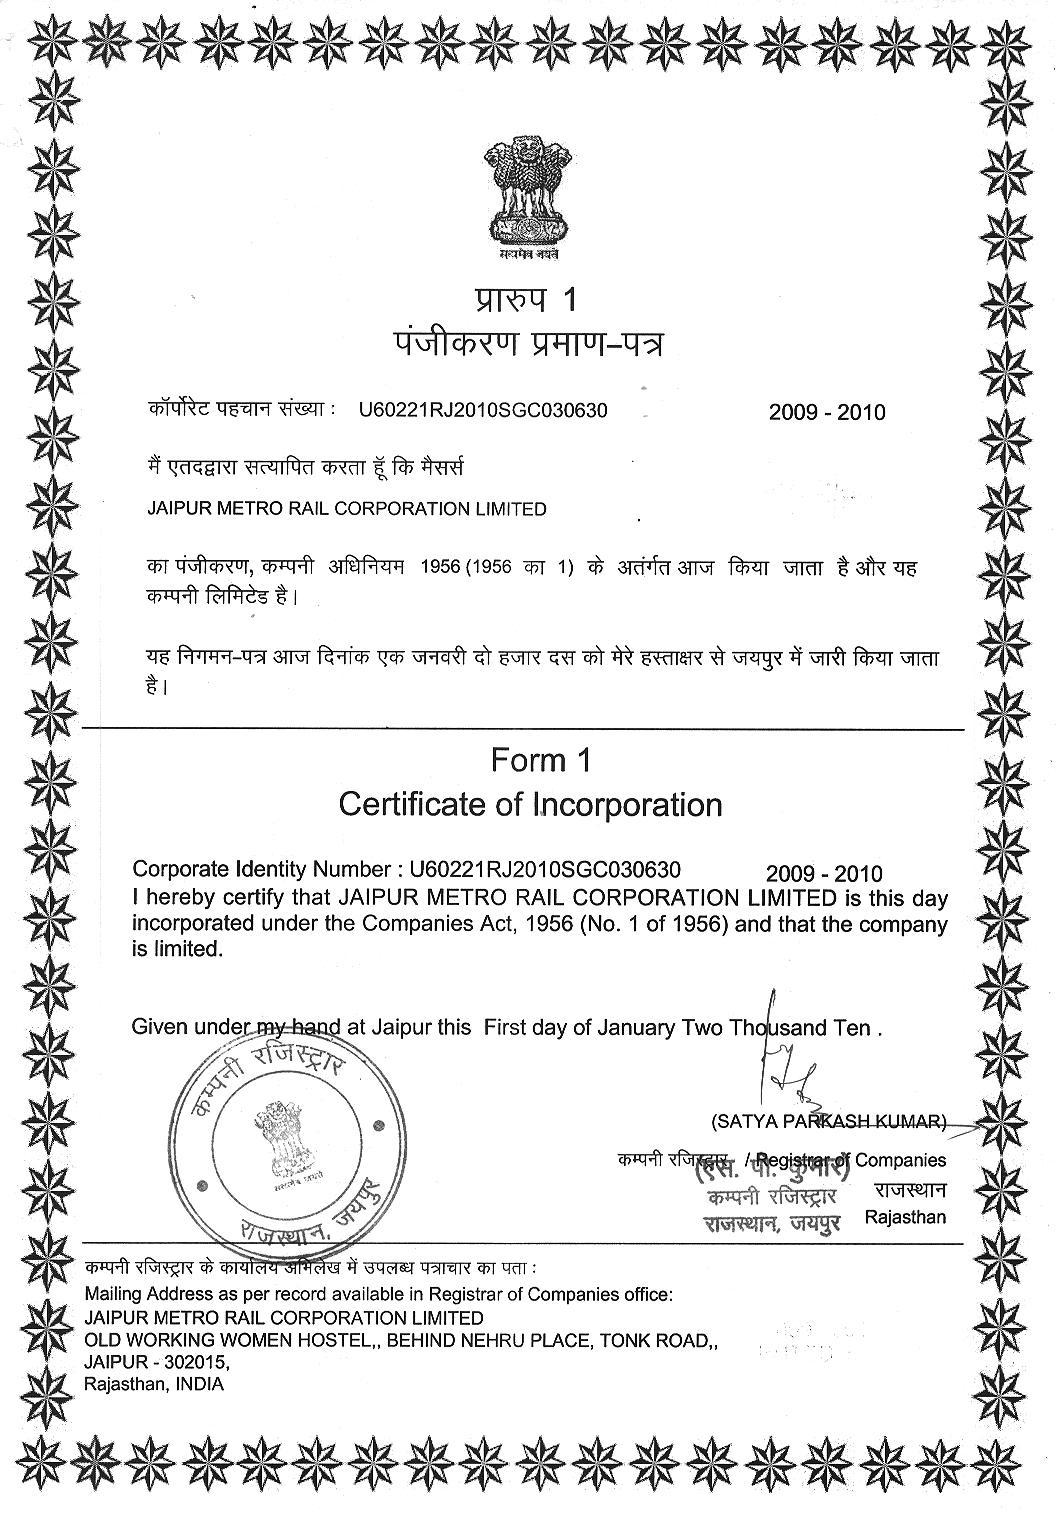 Jmrc Recruitment Rules 2012